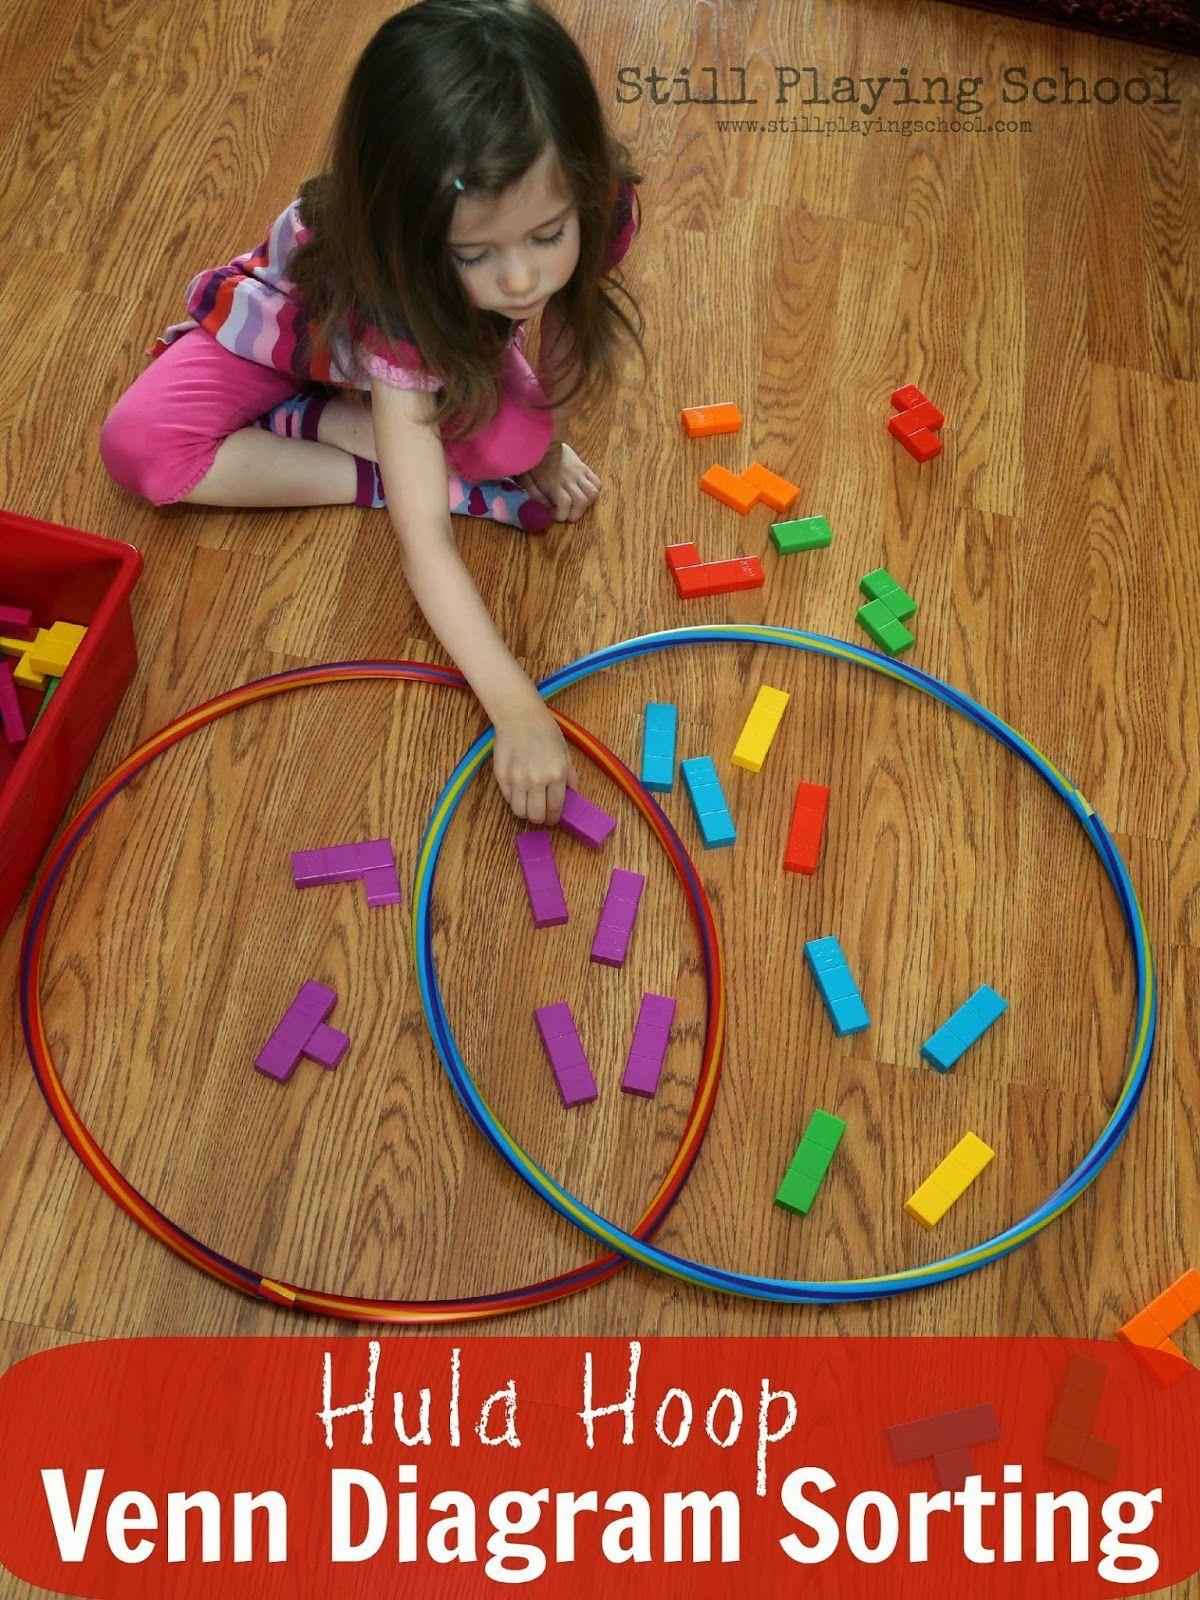 hight resolution of hula hoop venn diagram sorting venn diagrams math classroom kindergarten math classroom ideas